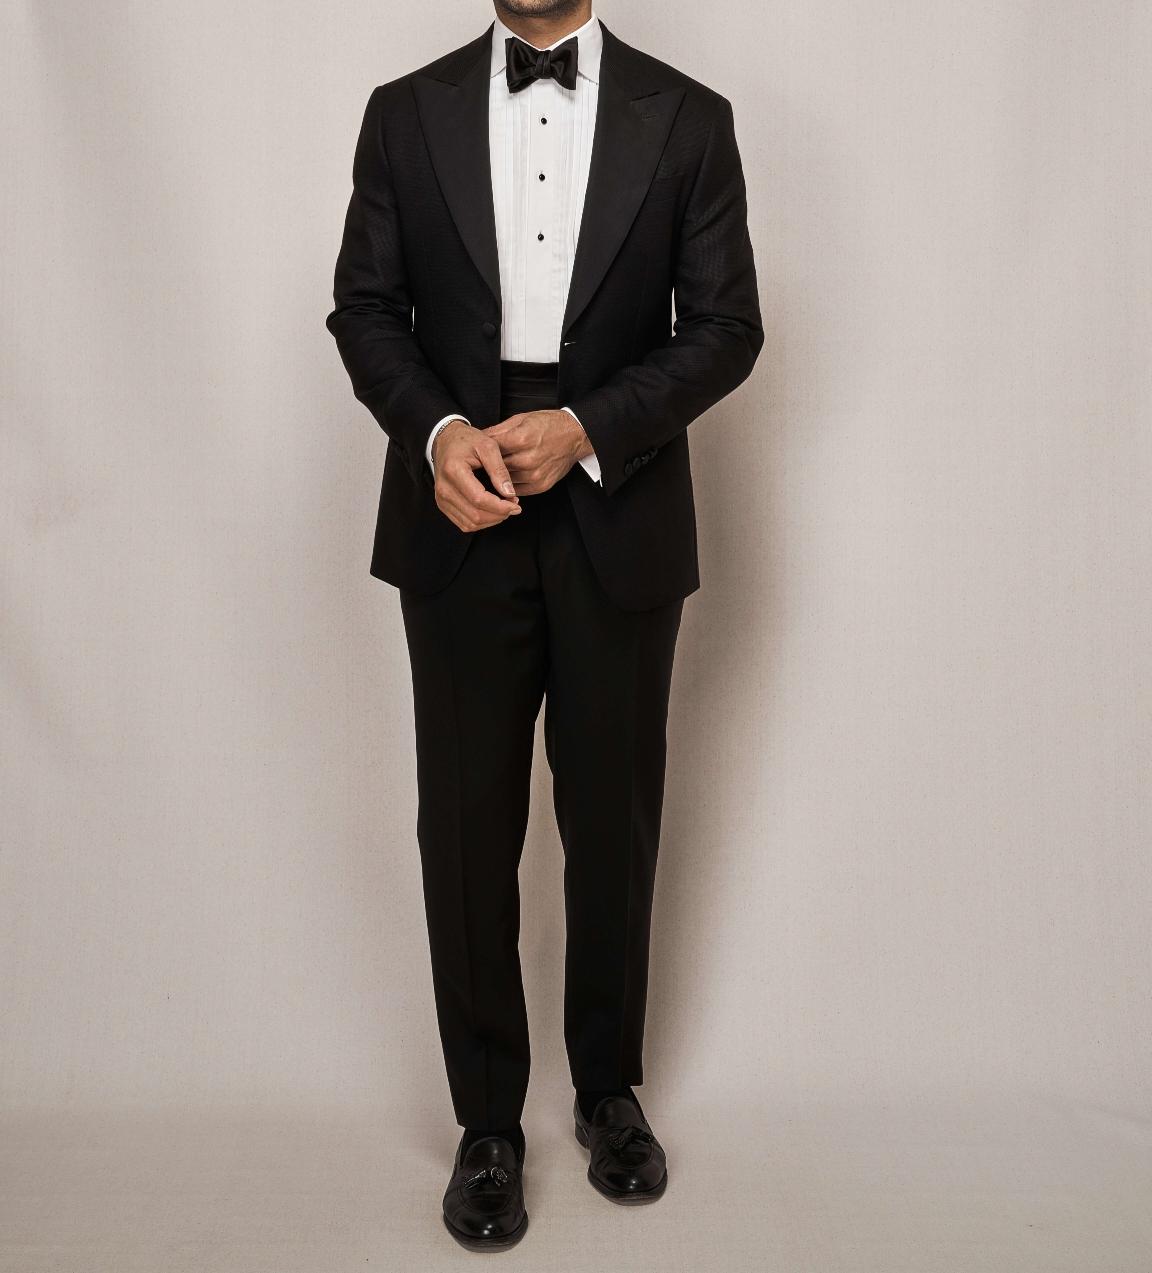 Man modelling classic tailor made black tuxedo